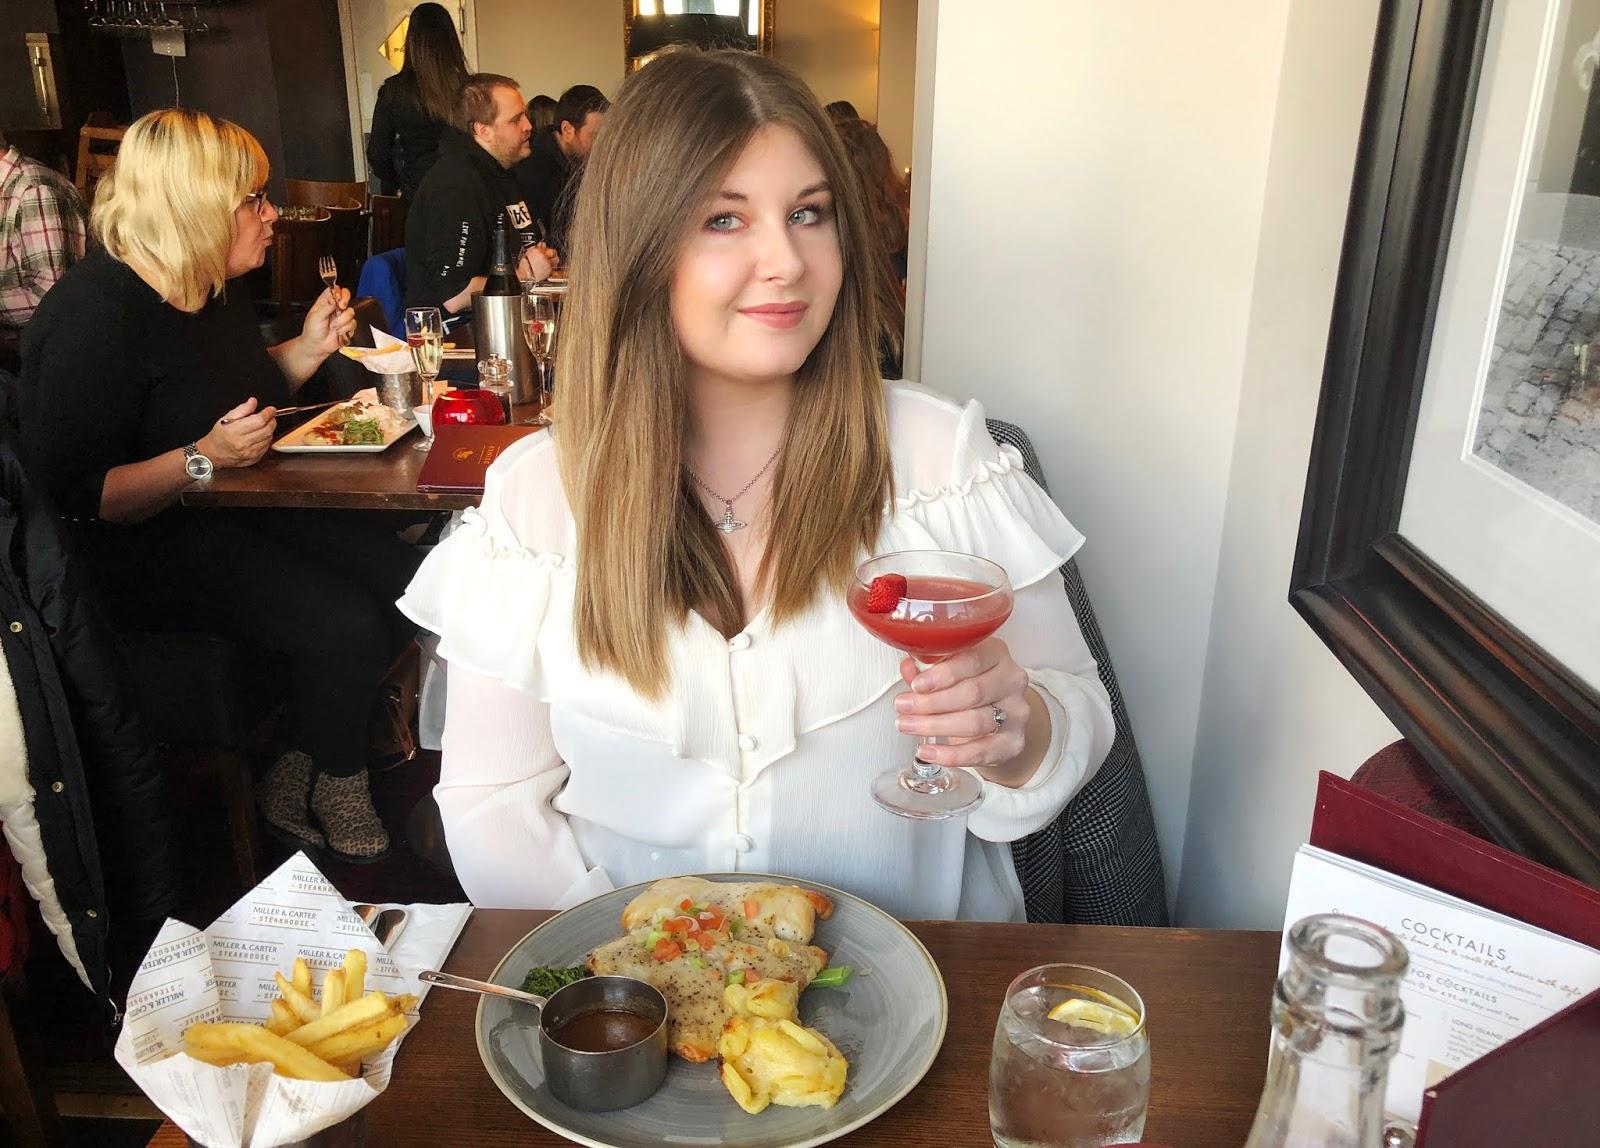 Grace inside a restaurant drinking a strawberry Daiquiri